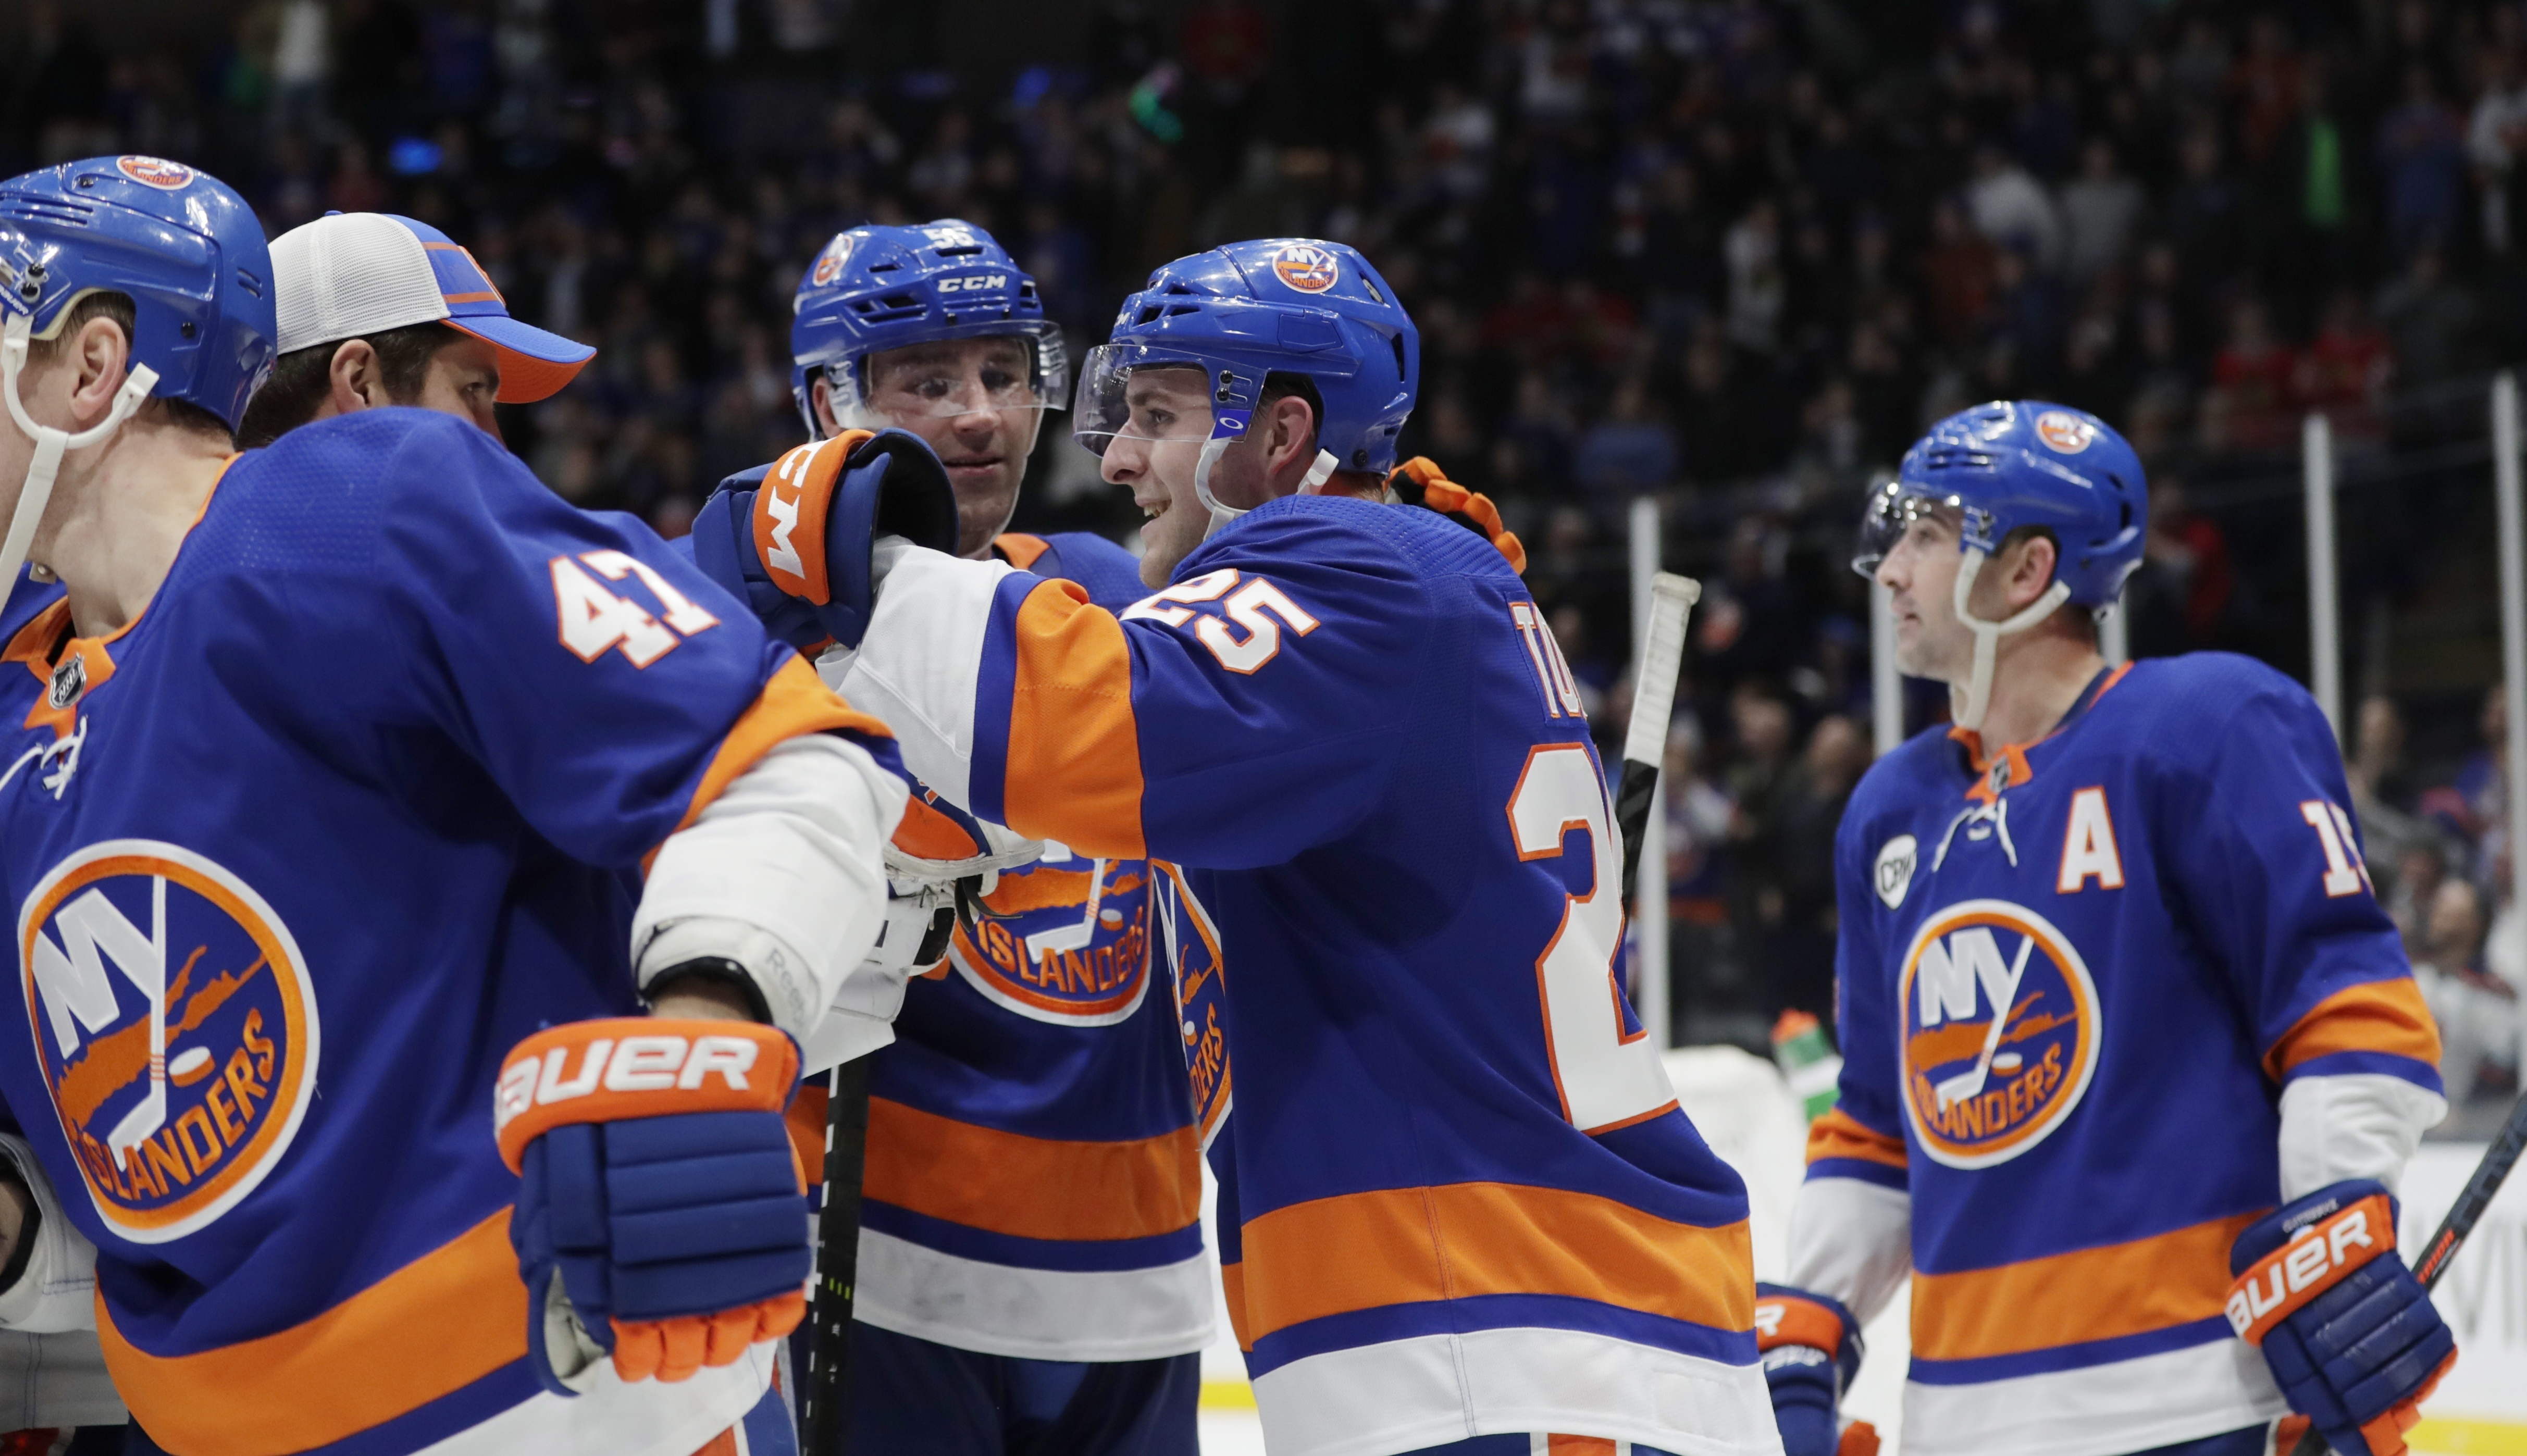 Toews scores first NHL goal, Islanders beat Blackhawks in OT